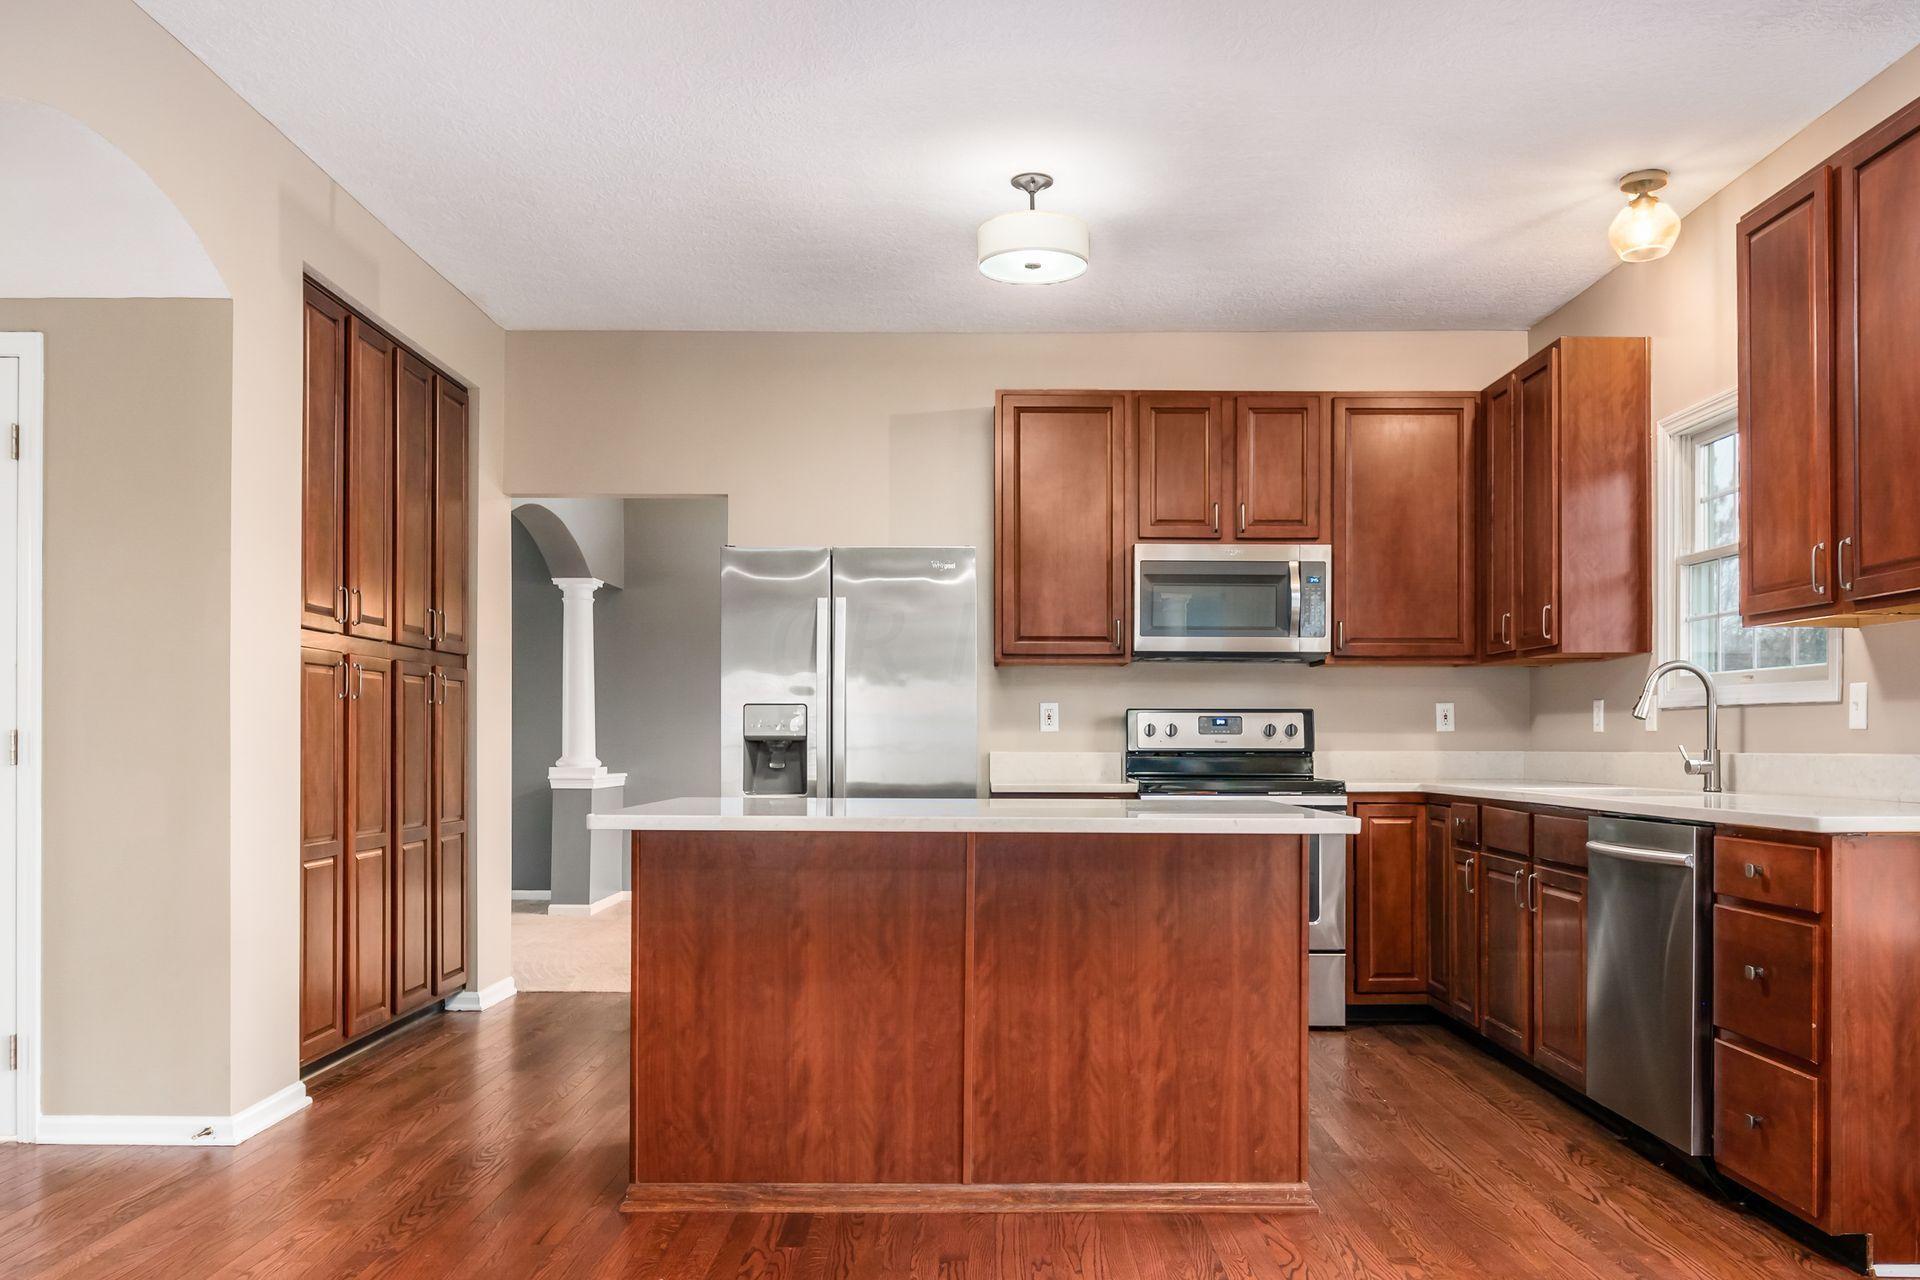 4530 Hoffman Farms Drive, Hilliard, Ohio 43026, 4 Bedrooms Bedrooms, ,4 BathroomsBathrooms,Residential,For Sale,Hoffman Farms,221000617